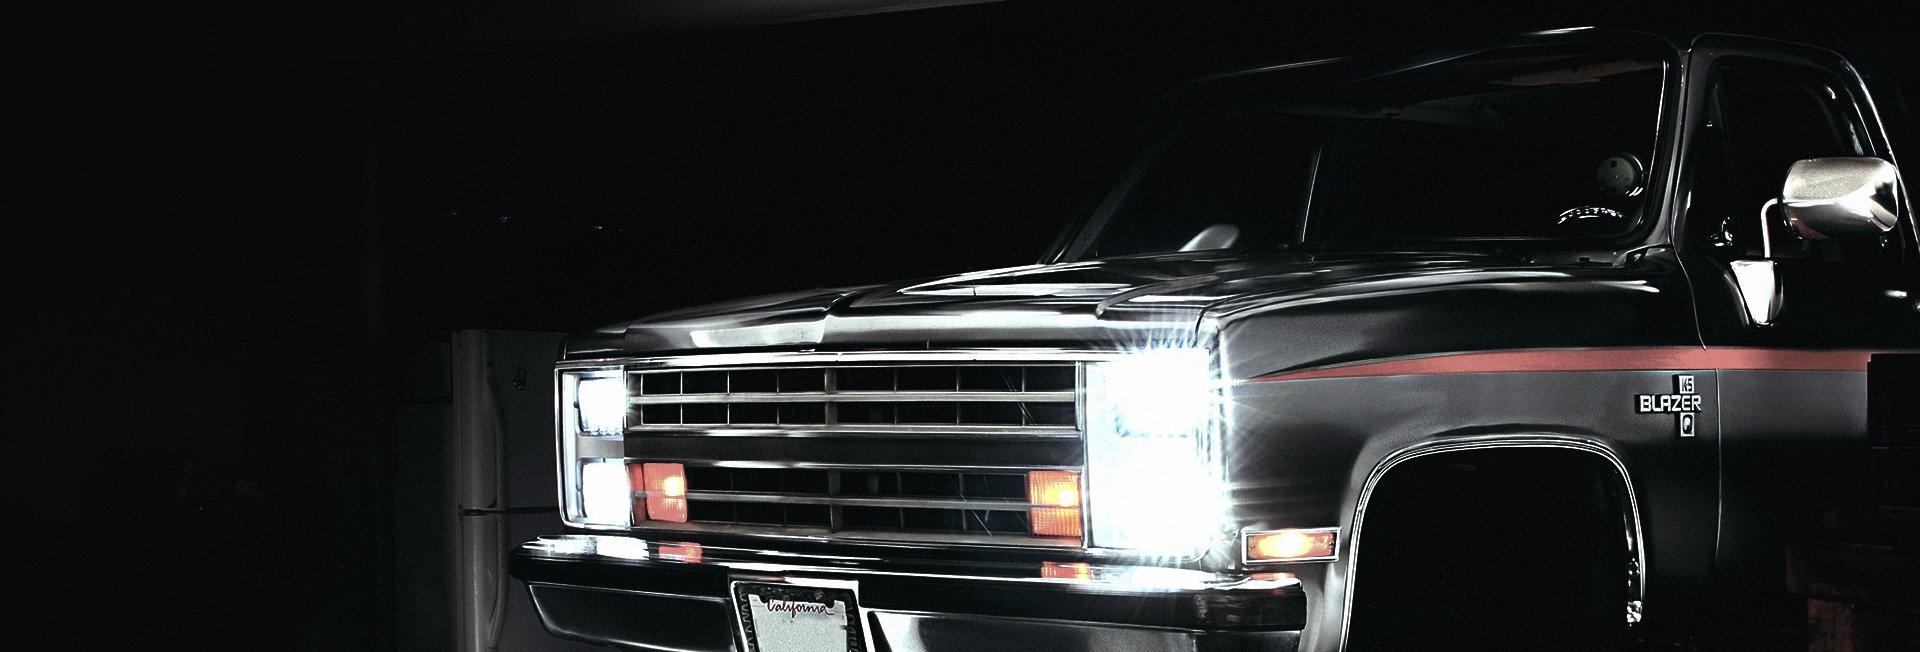 Led Headlights For Cars And Trucks Vehicle Lighting Fuse Box 1920